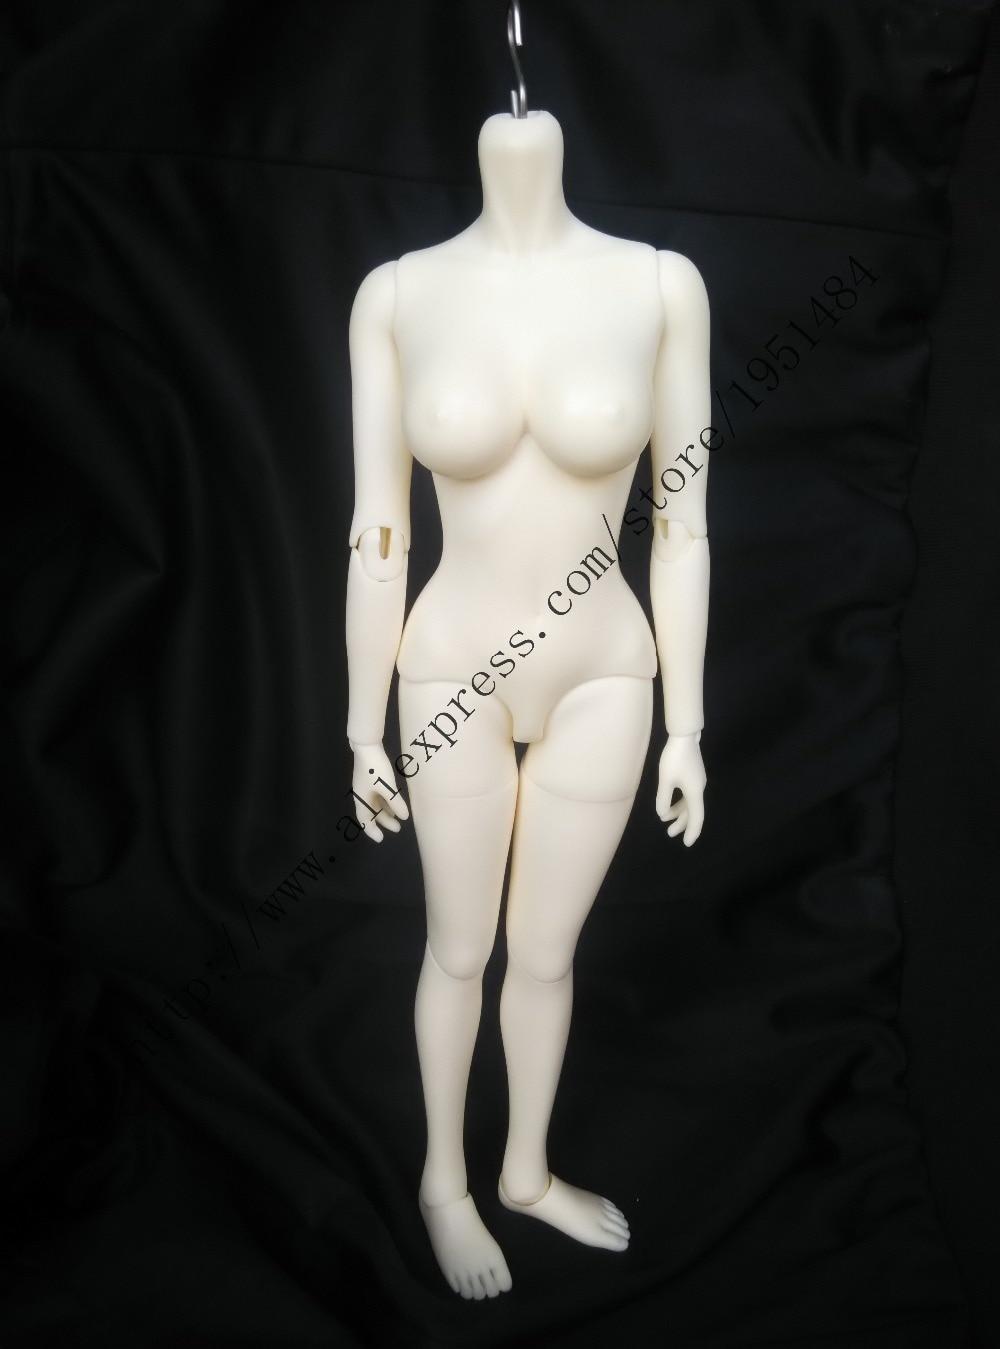 stenzhorn(stenzhorn) BJD SD 1/4 Resin BJD Doll Body women 1 4 1 3 sd17 uncle bjd sd doll accessories bjd clothes black sleeve t shirt